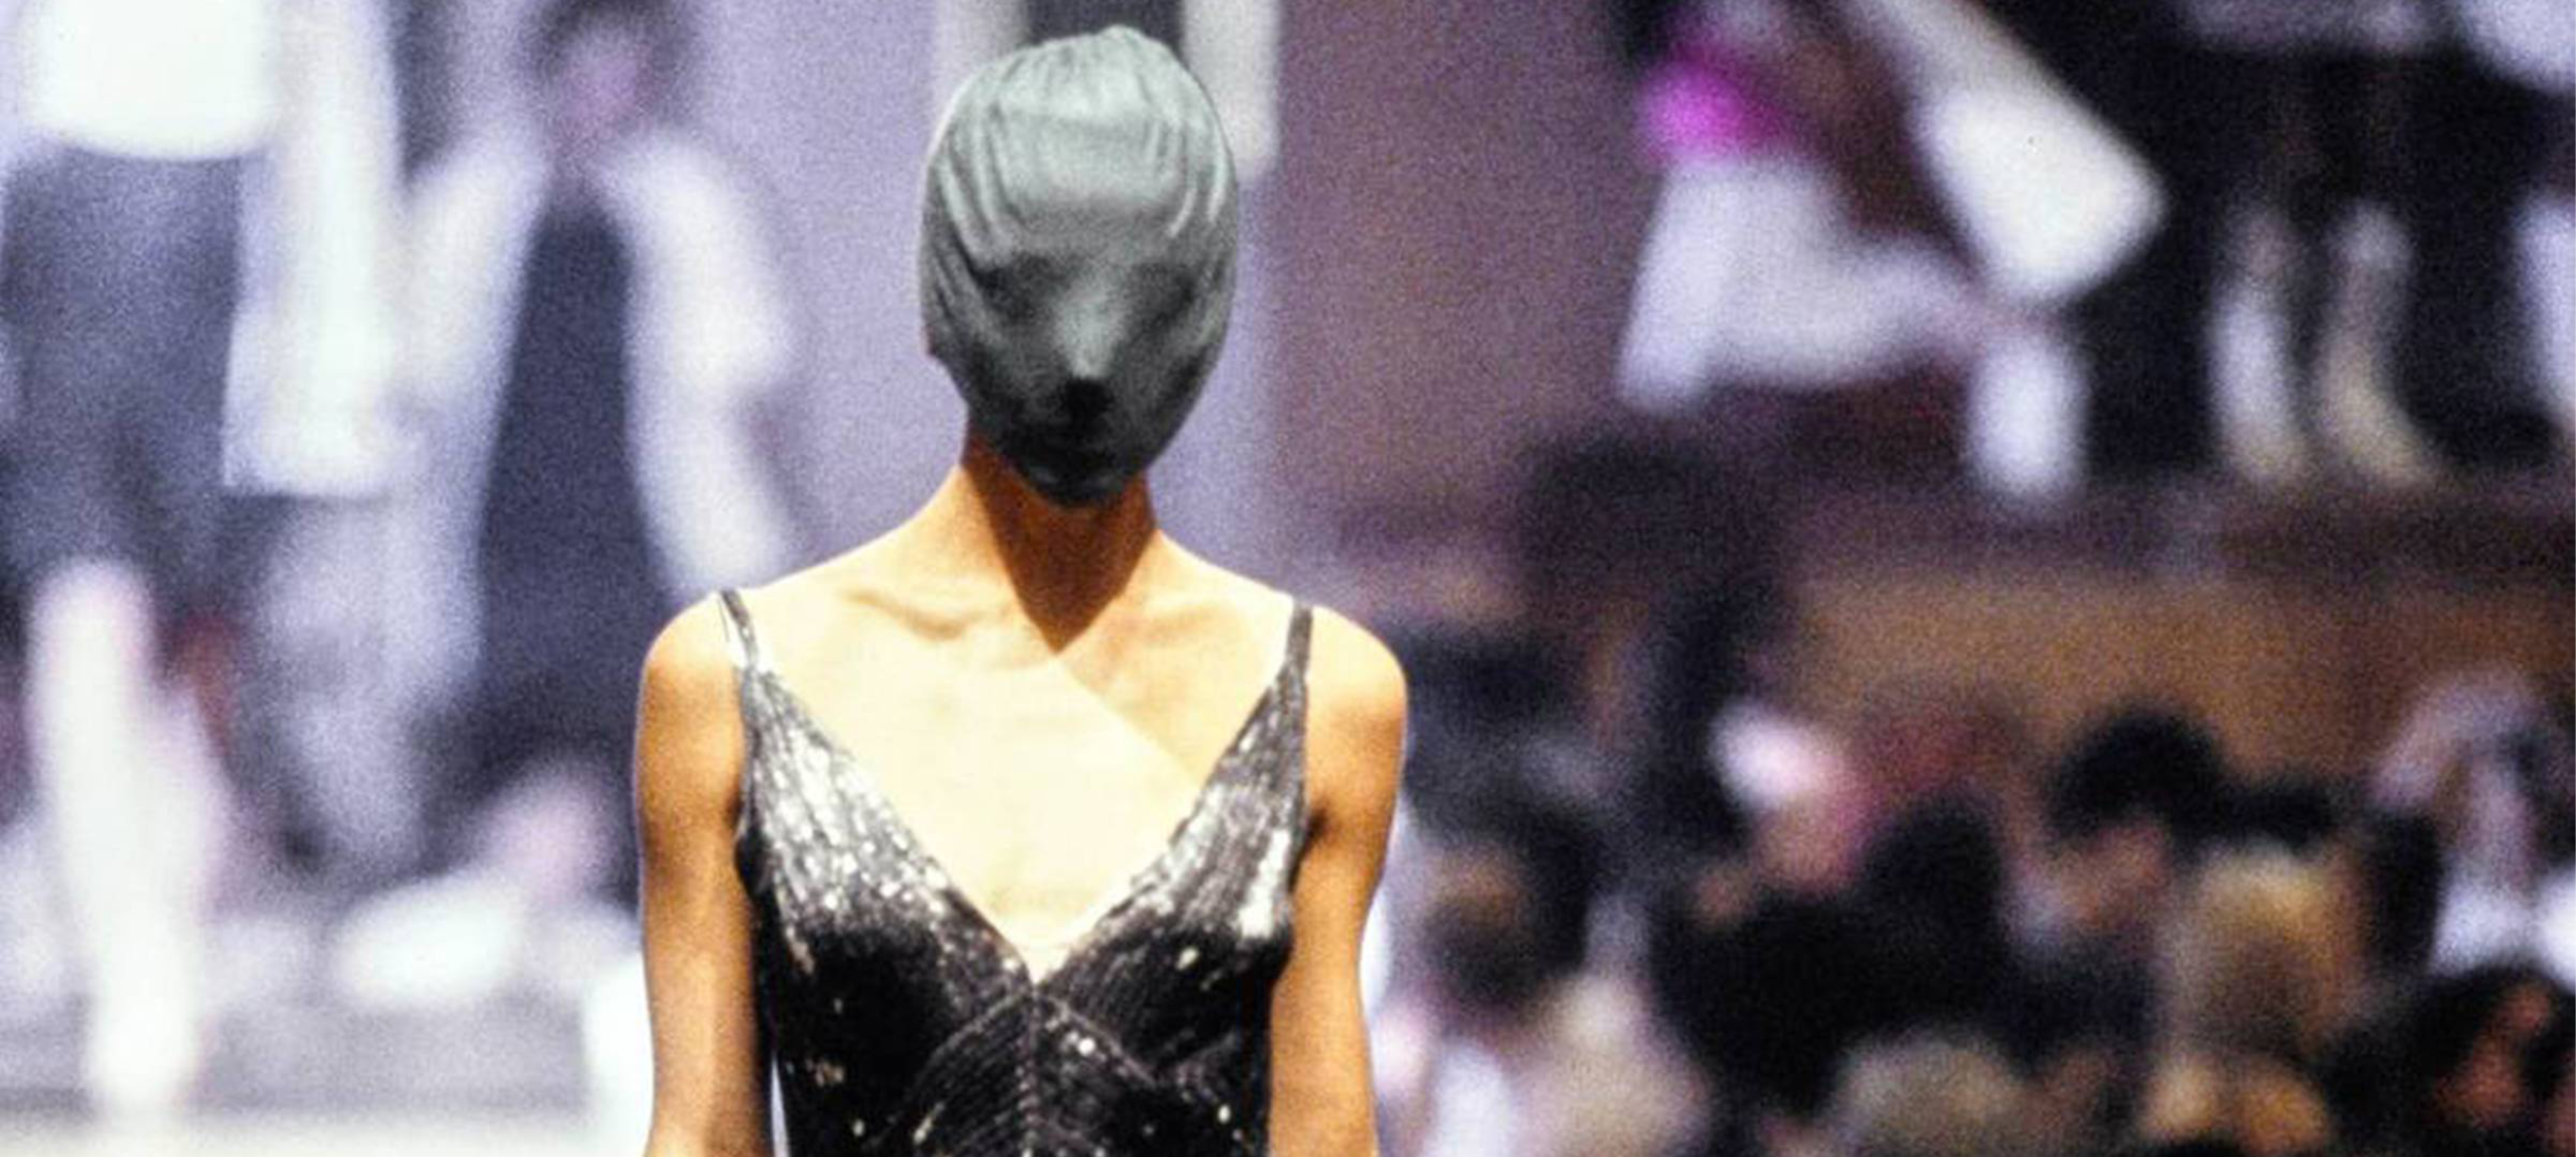 Iconische Designer Martin Margiela Breekt na Jaren de Stilte